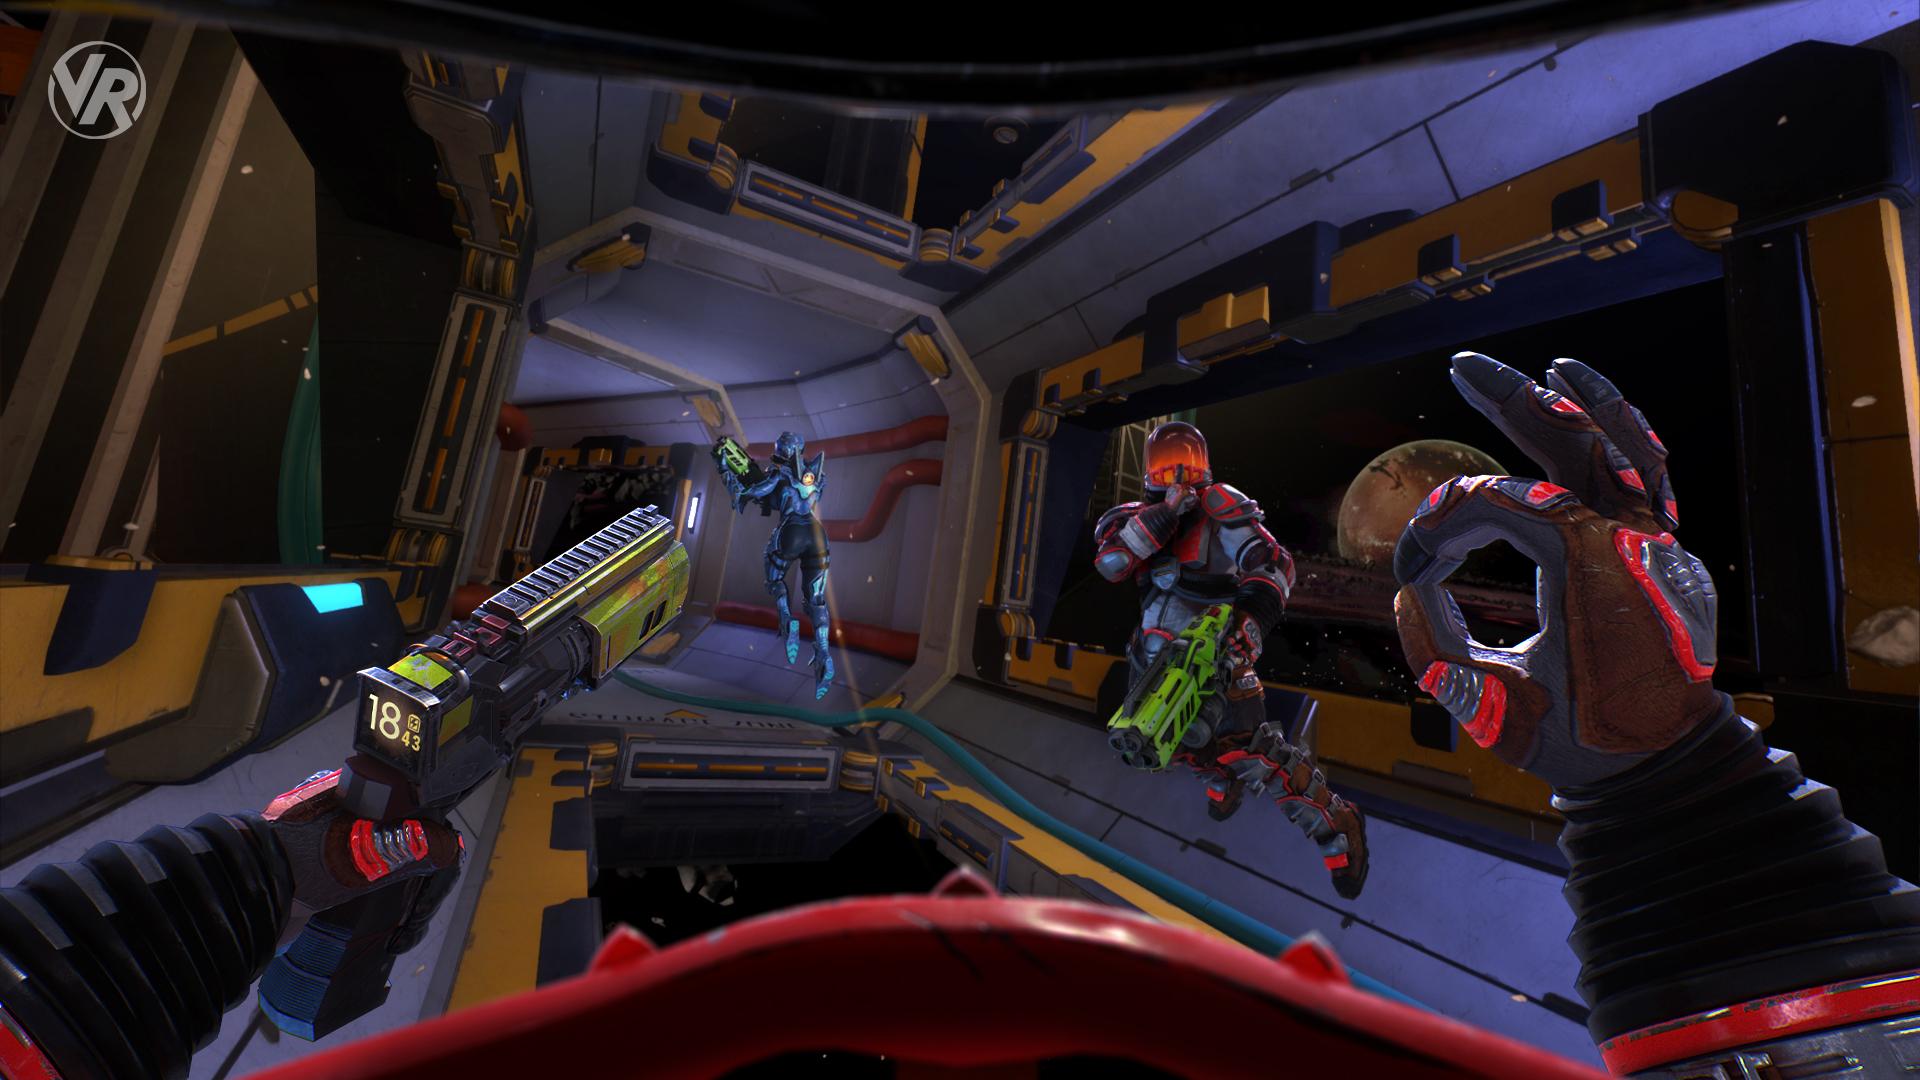 Ubisoft's VR shooter Space Junkies gets an open beta on June 28 screenshot